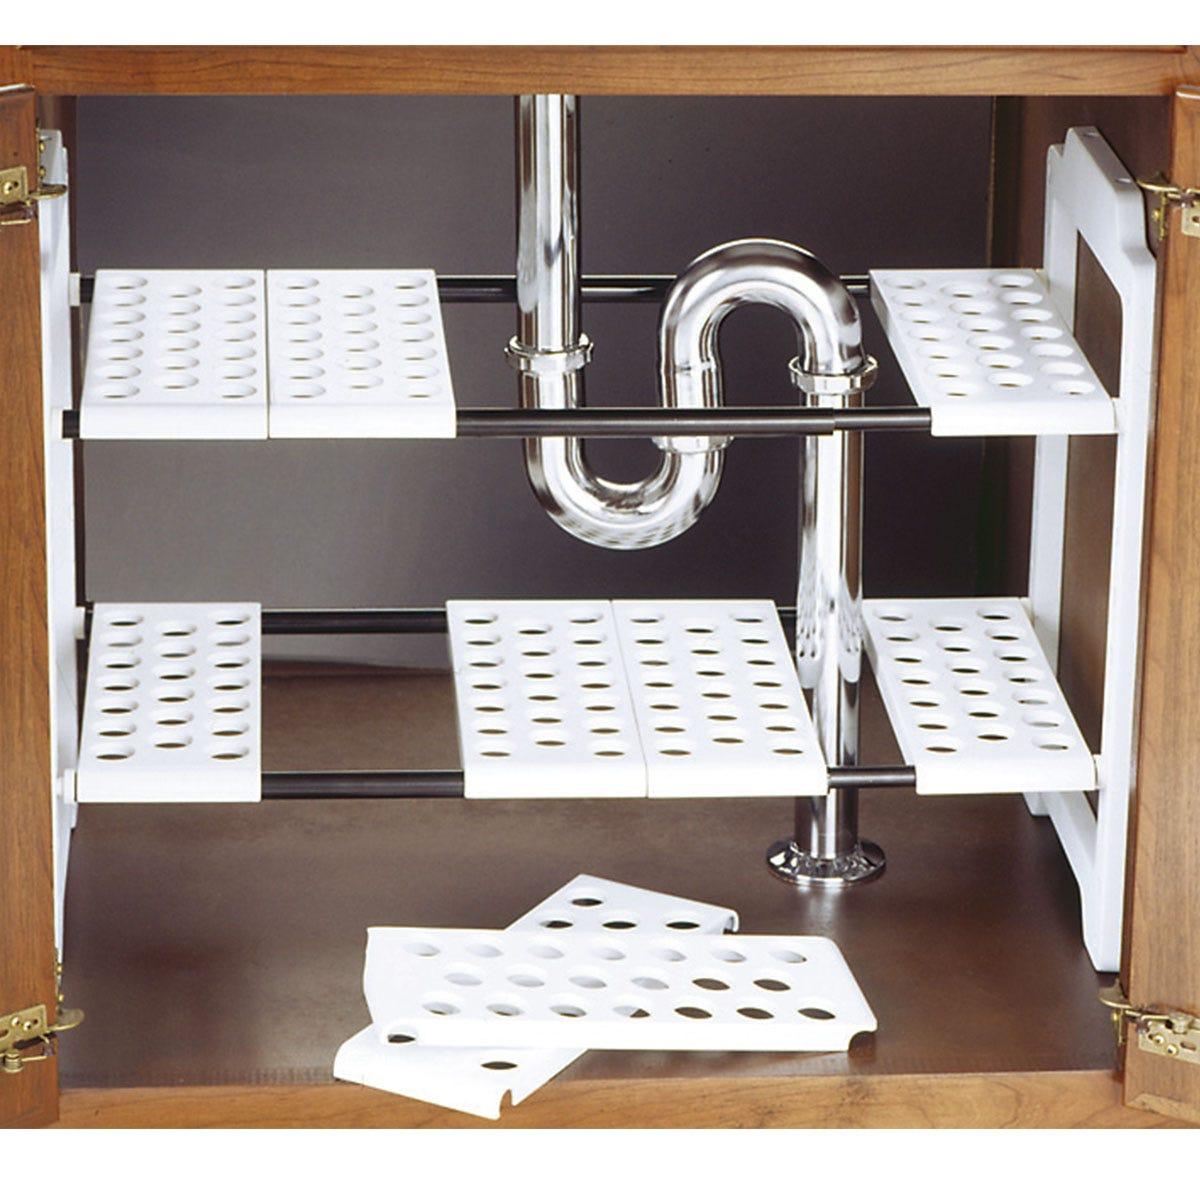 Image of Addis Under Sink Storage Unit - White